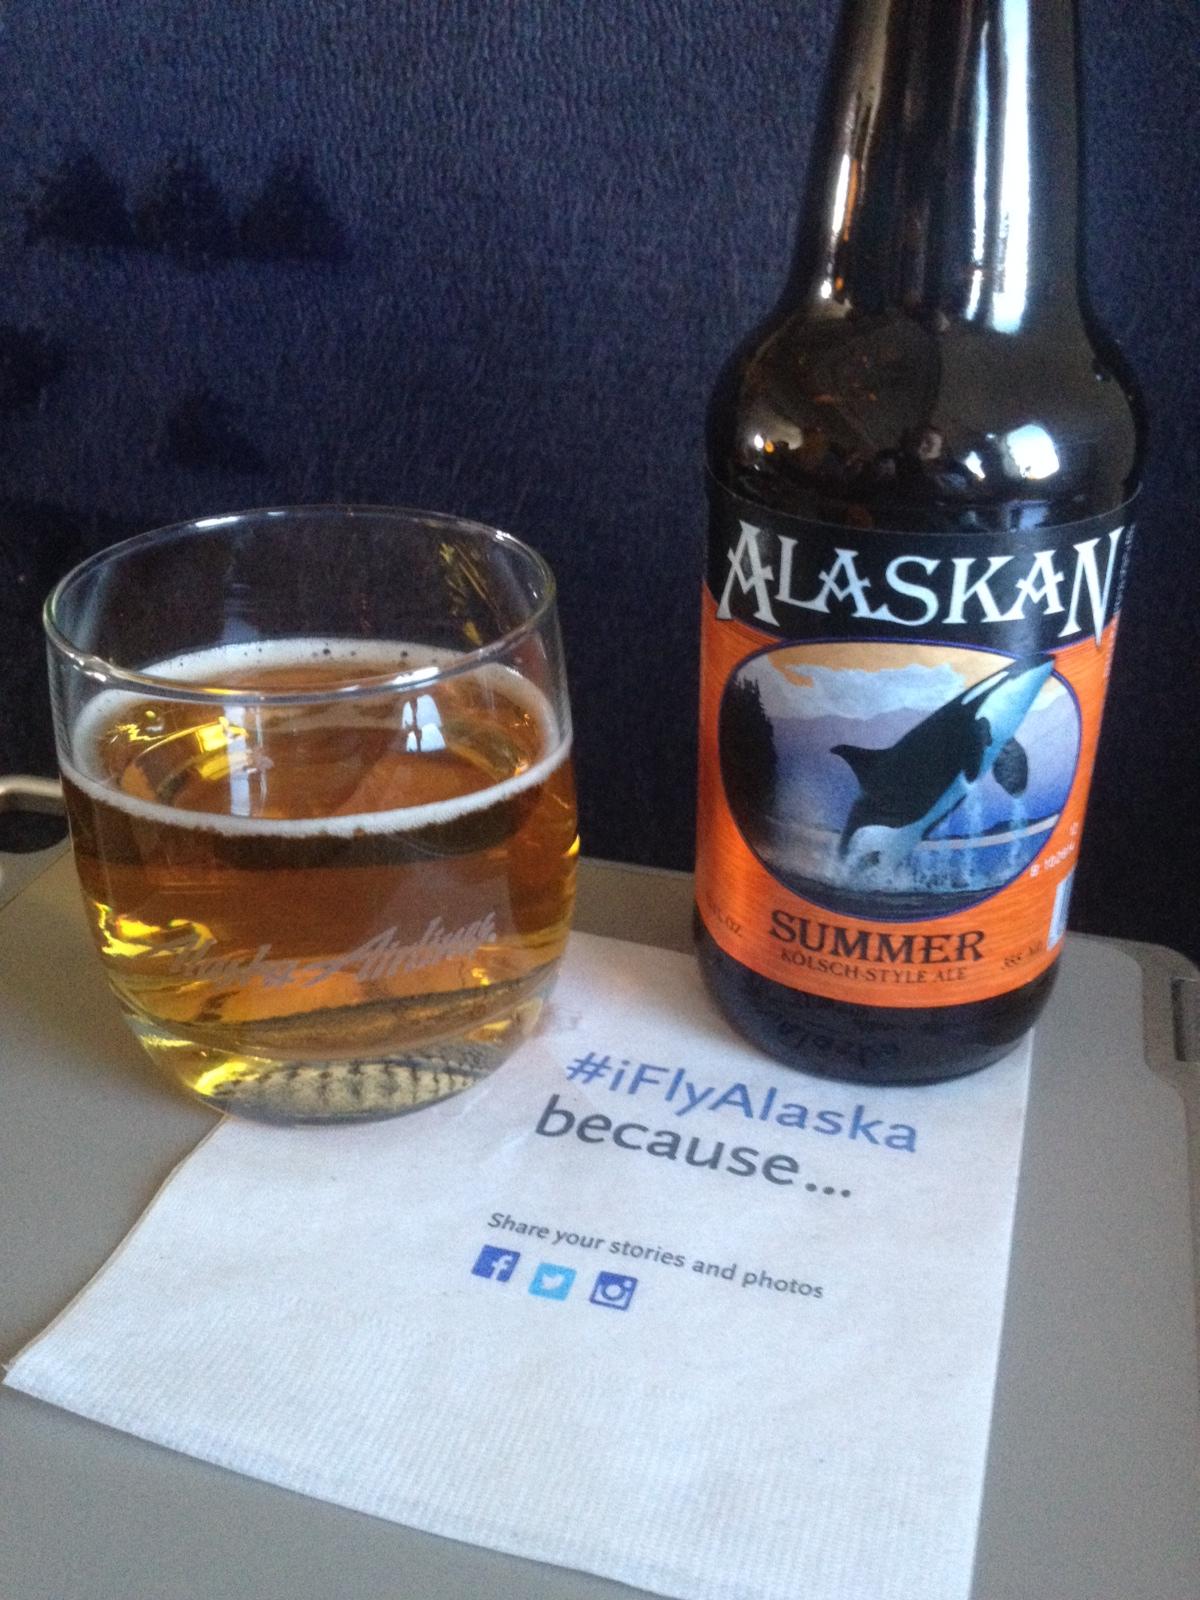 alaskan amber beer onboard alaska airlines